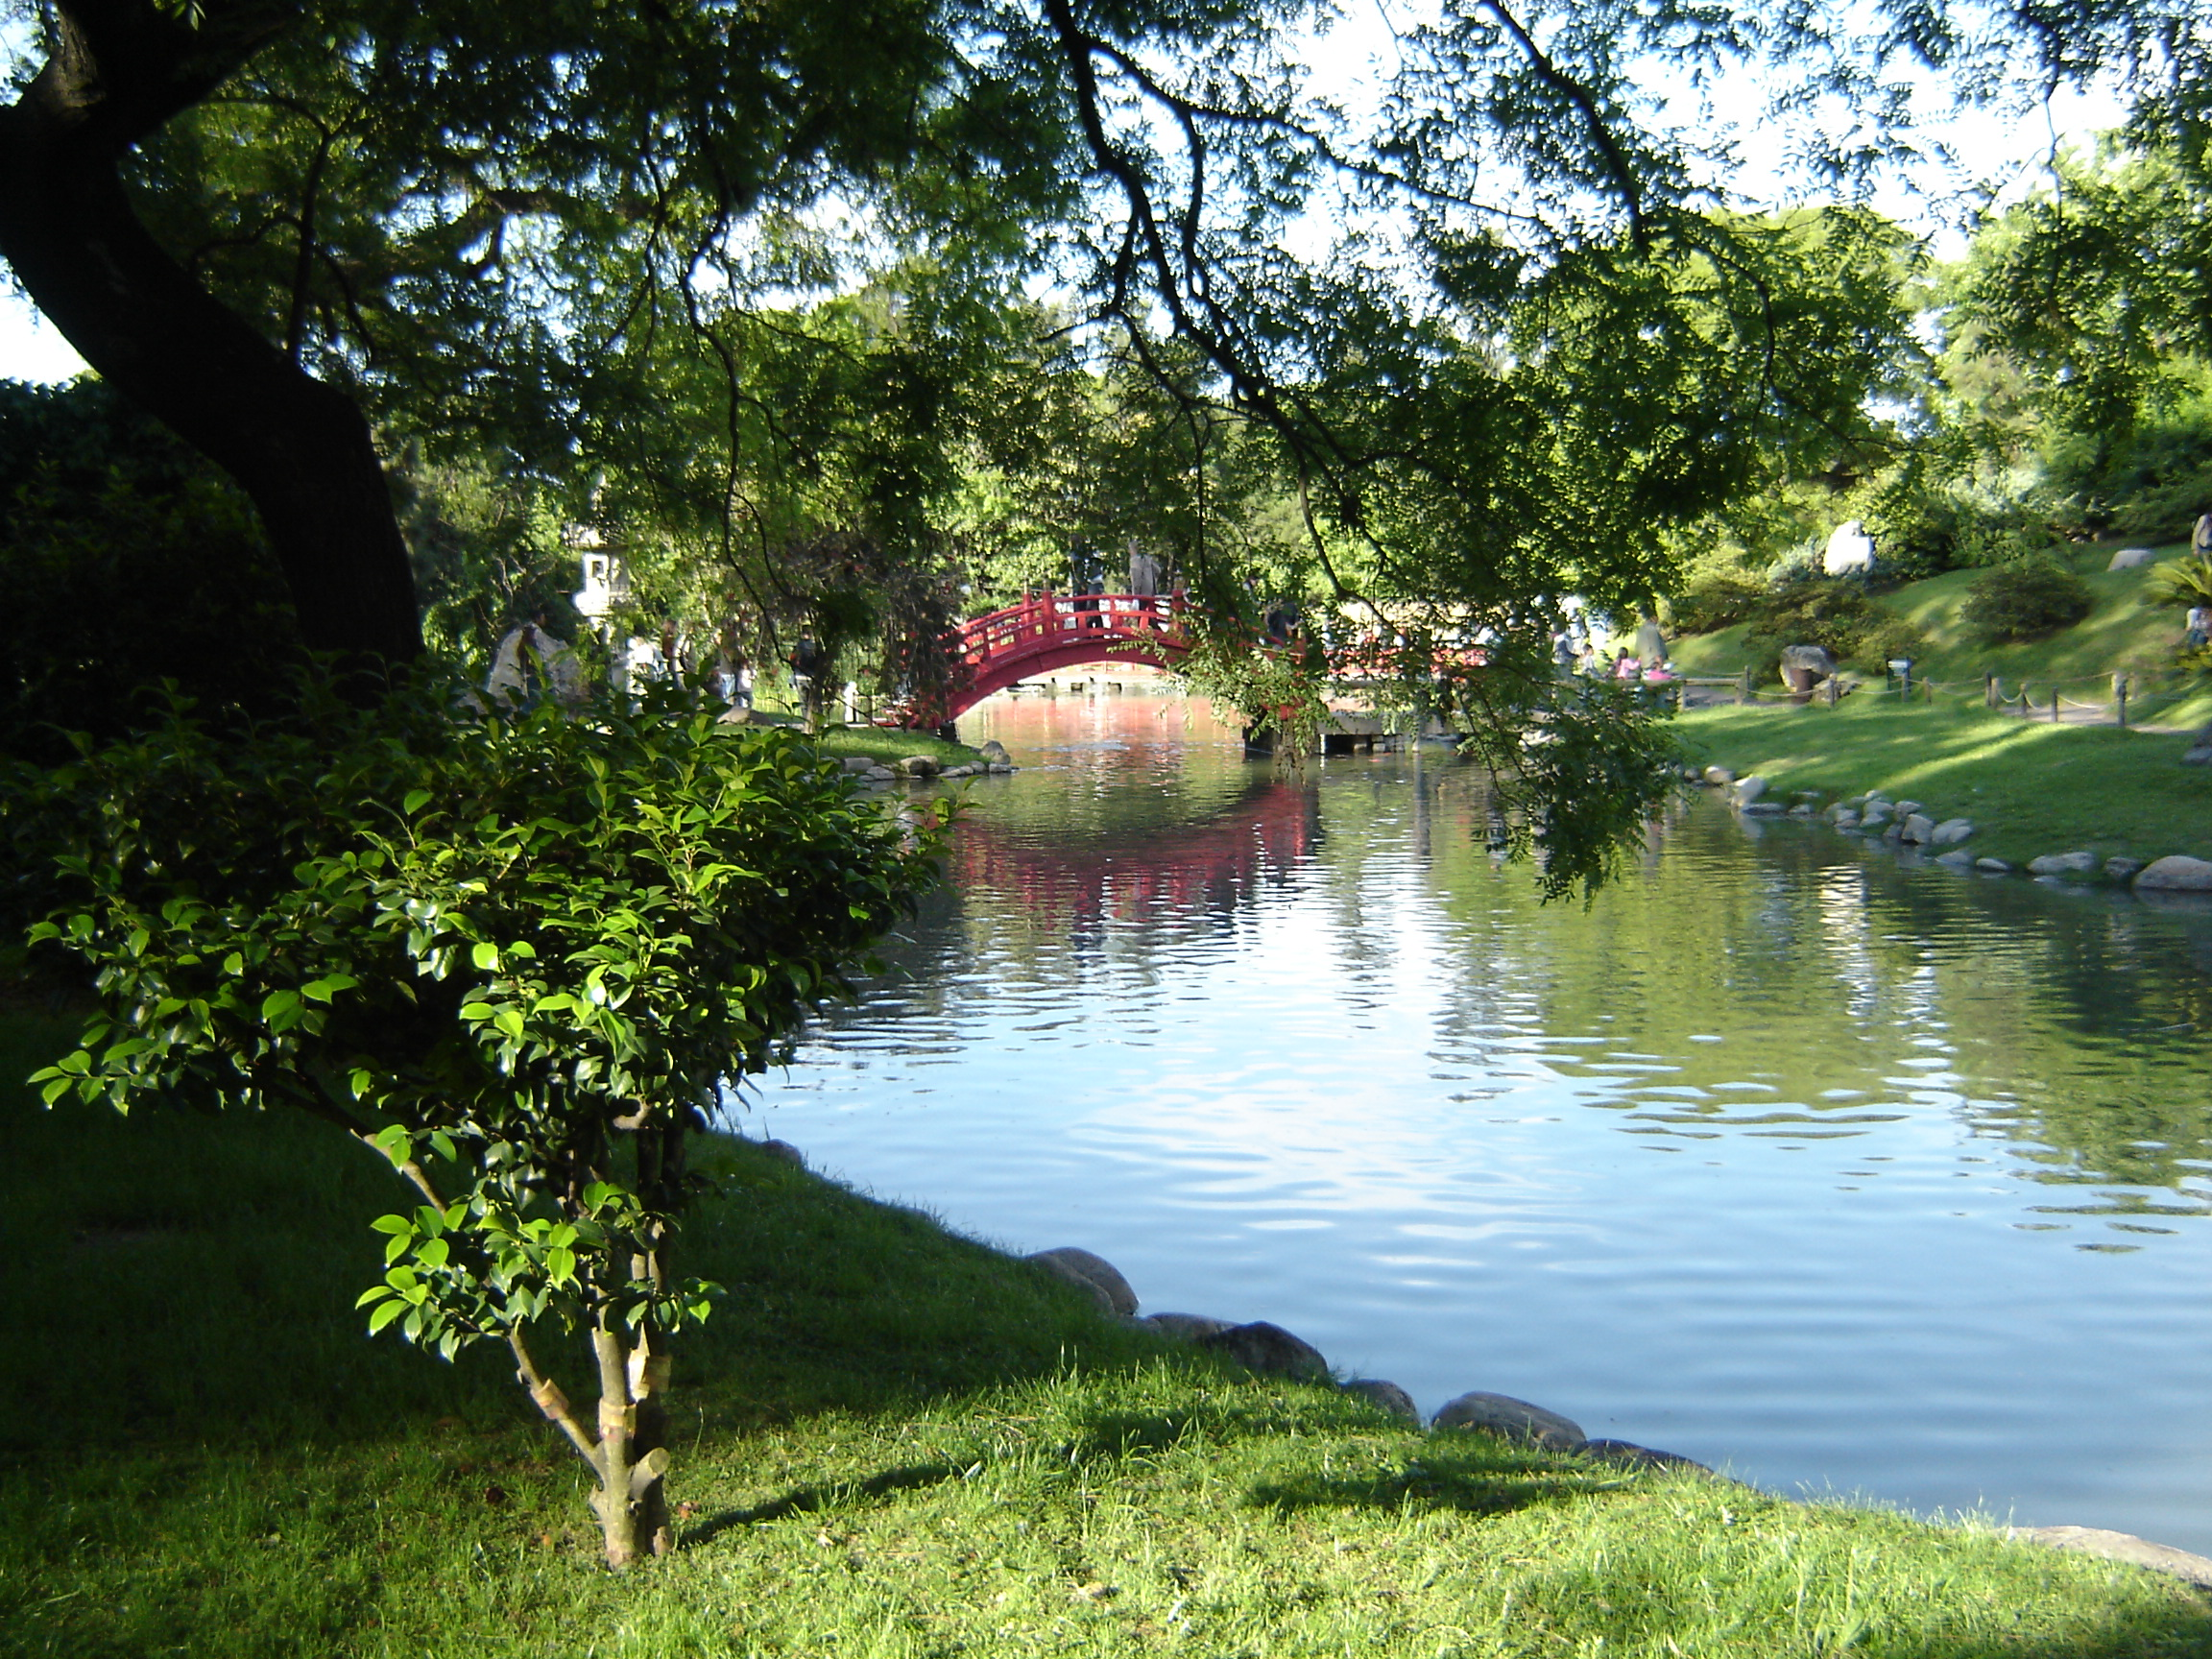 Fotos del jardines taringa for Fotos de jardines